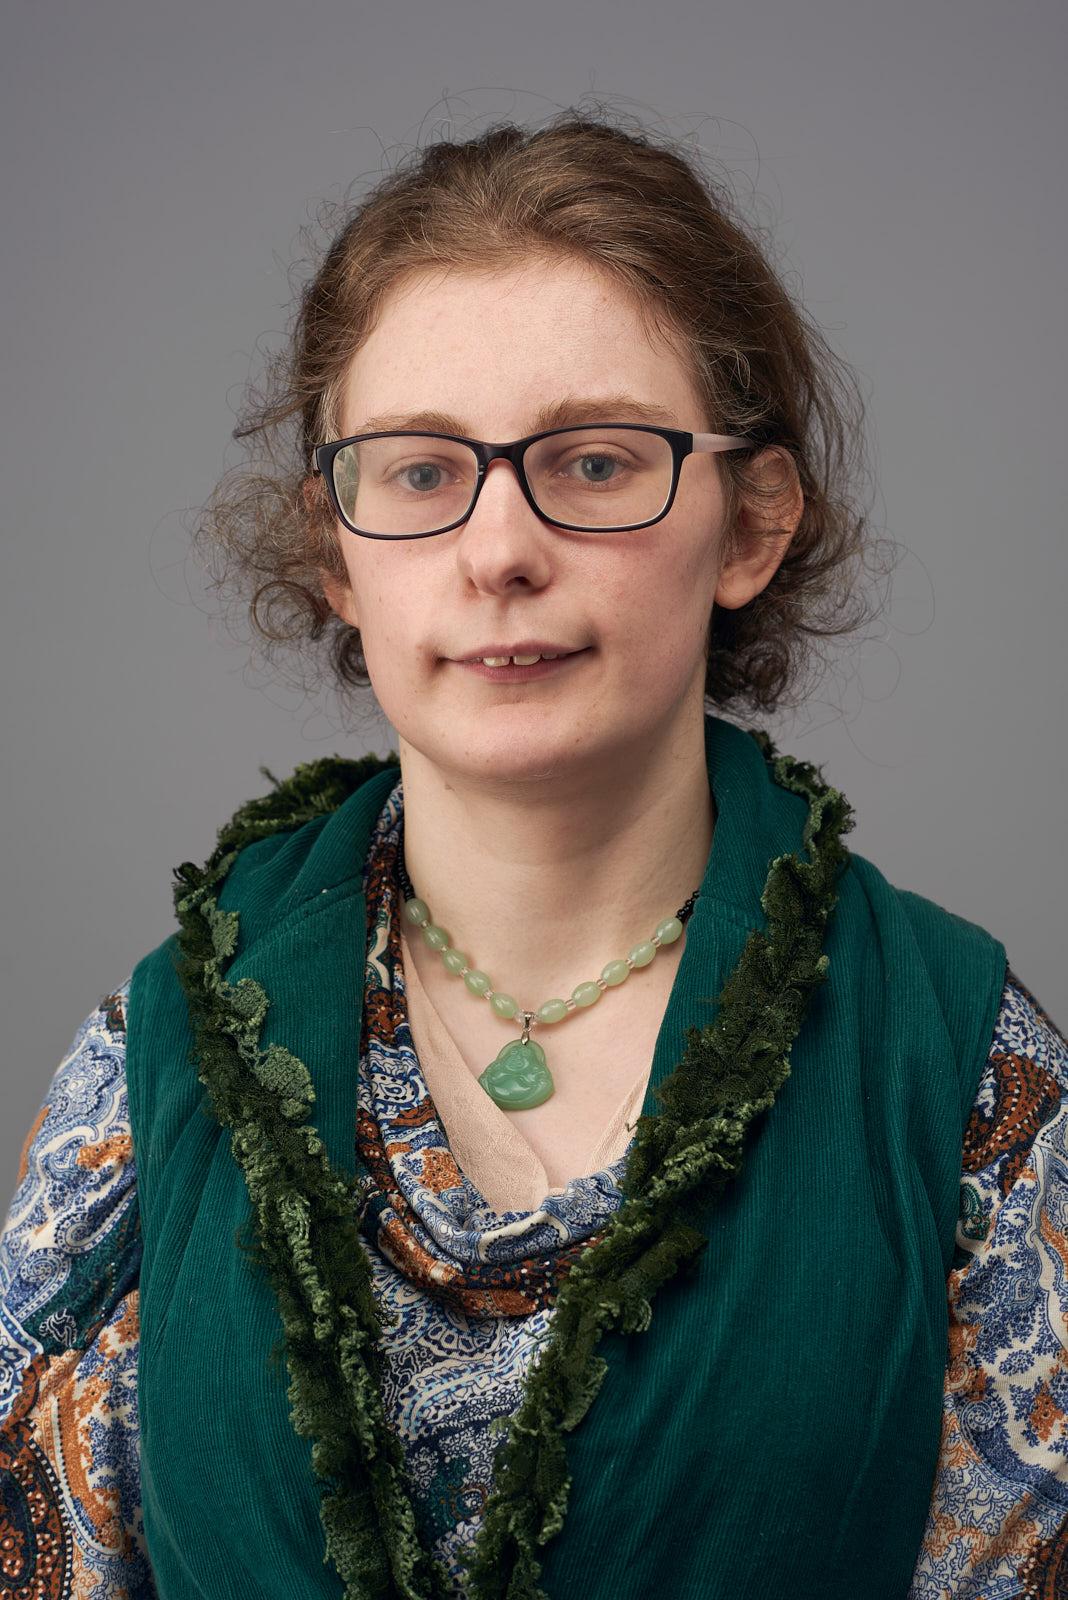 Alice: Artist, Gardener, Volunteer at Internet access facility - Warburton Online.